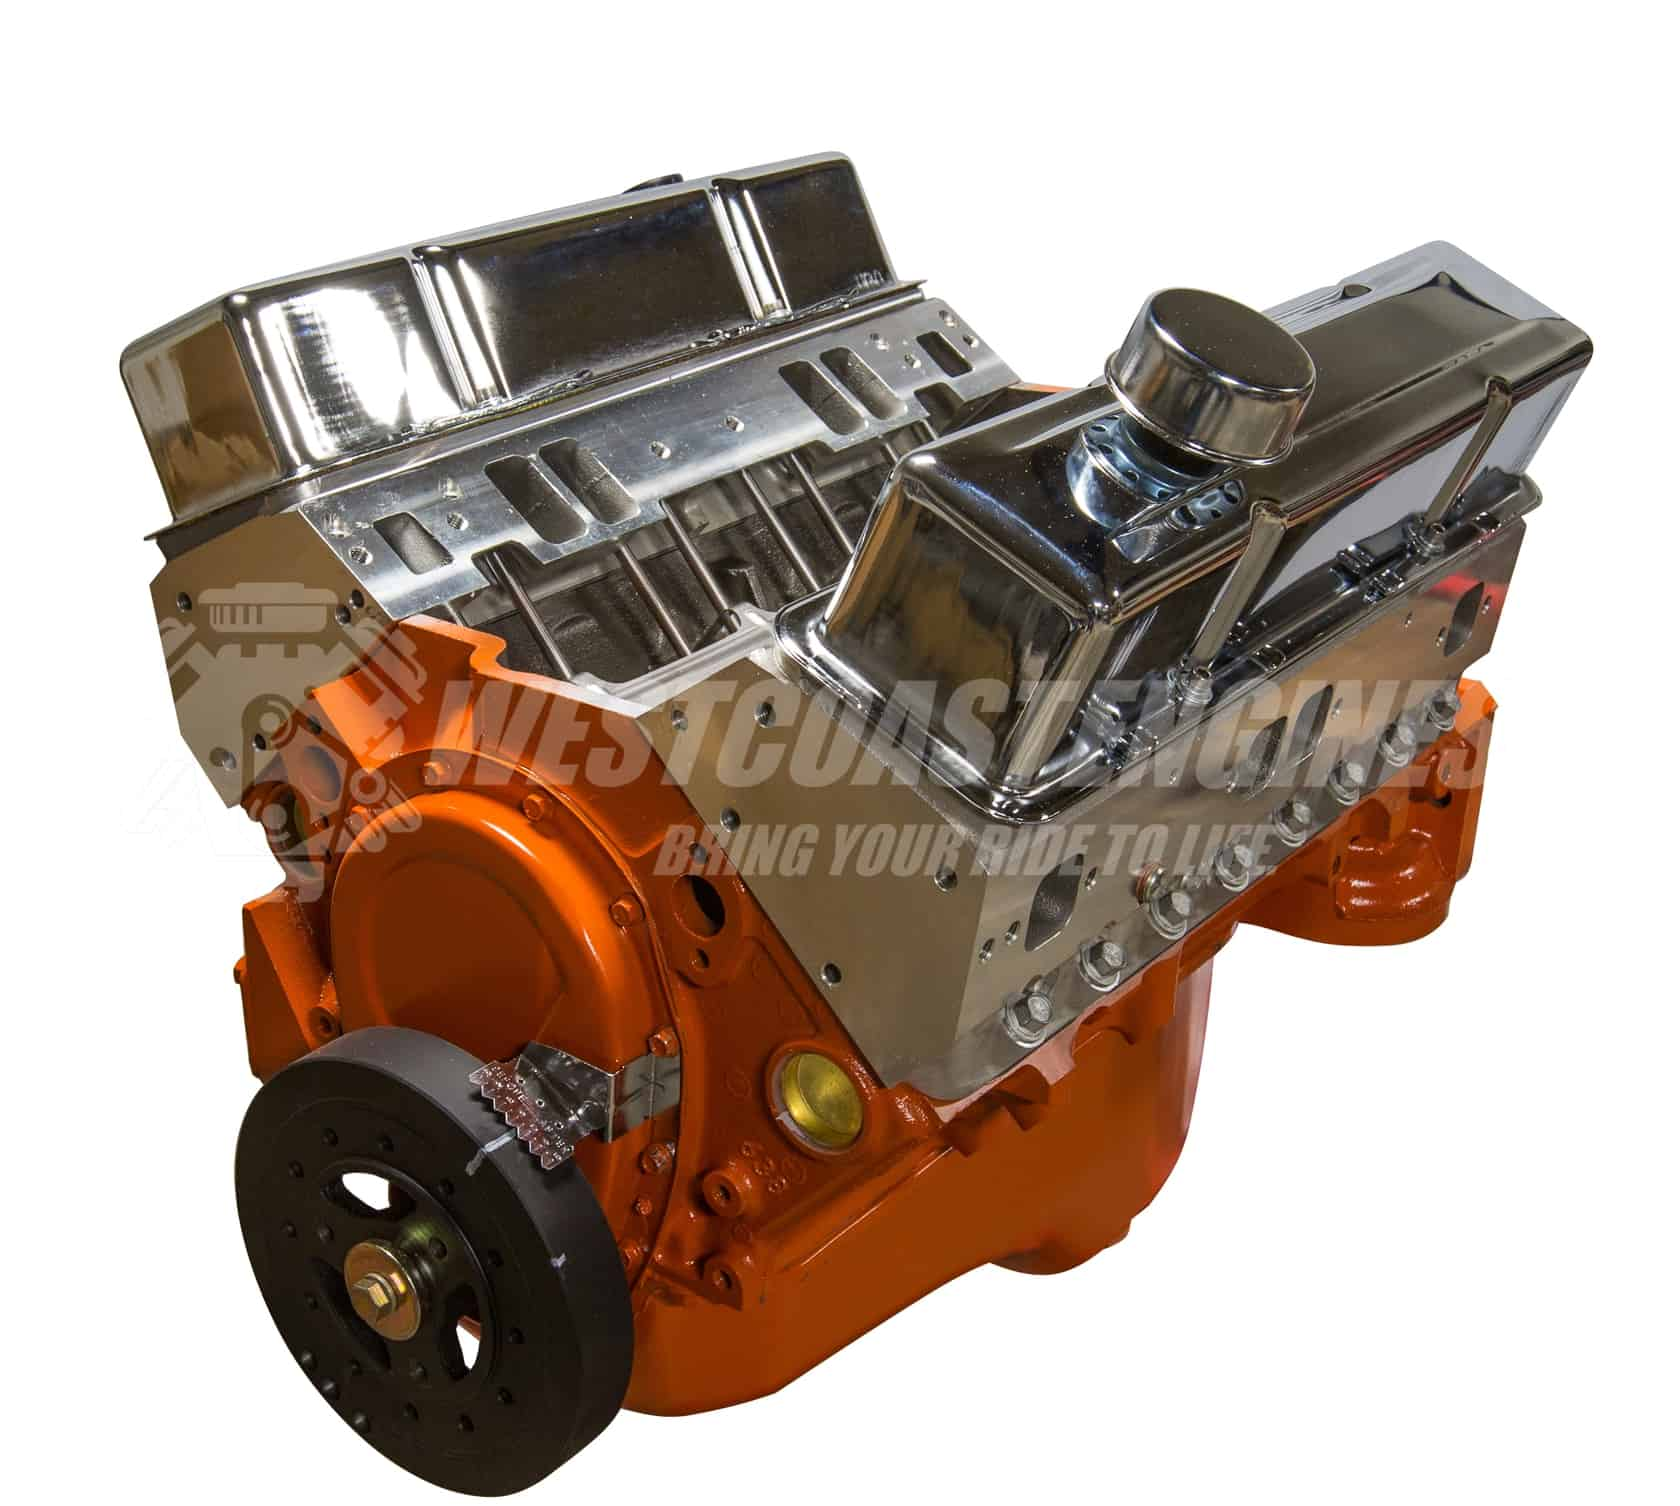 Terrific 383 Stroker 500 Hp Turnkey Motor The Rumbler West Coast Engines Wiring Cloud Waroletkolfr09Org